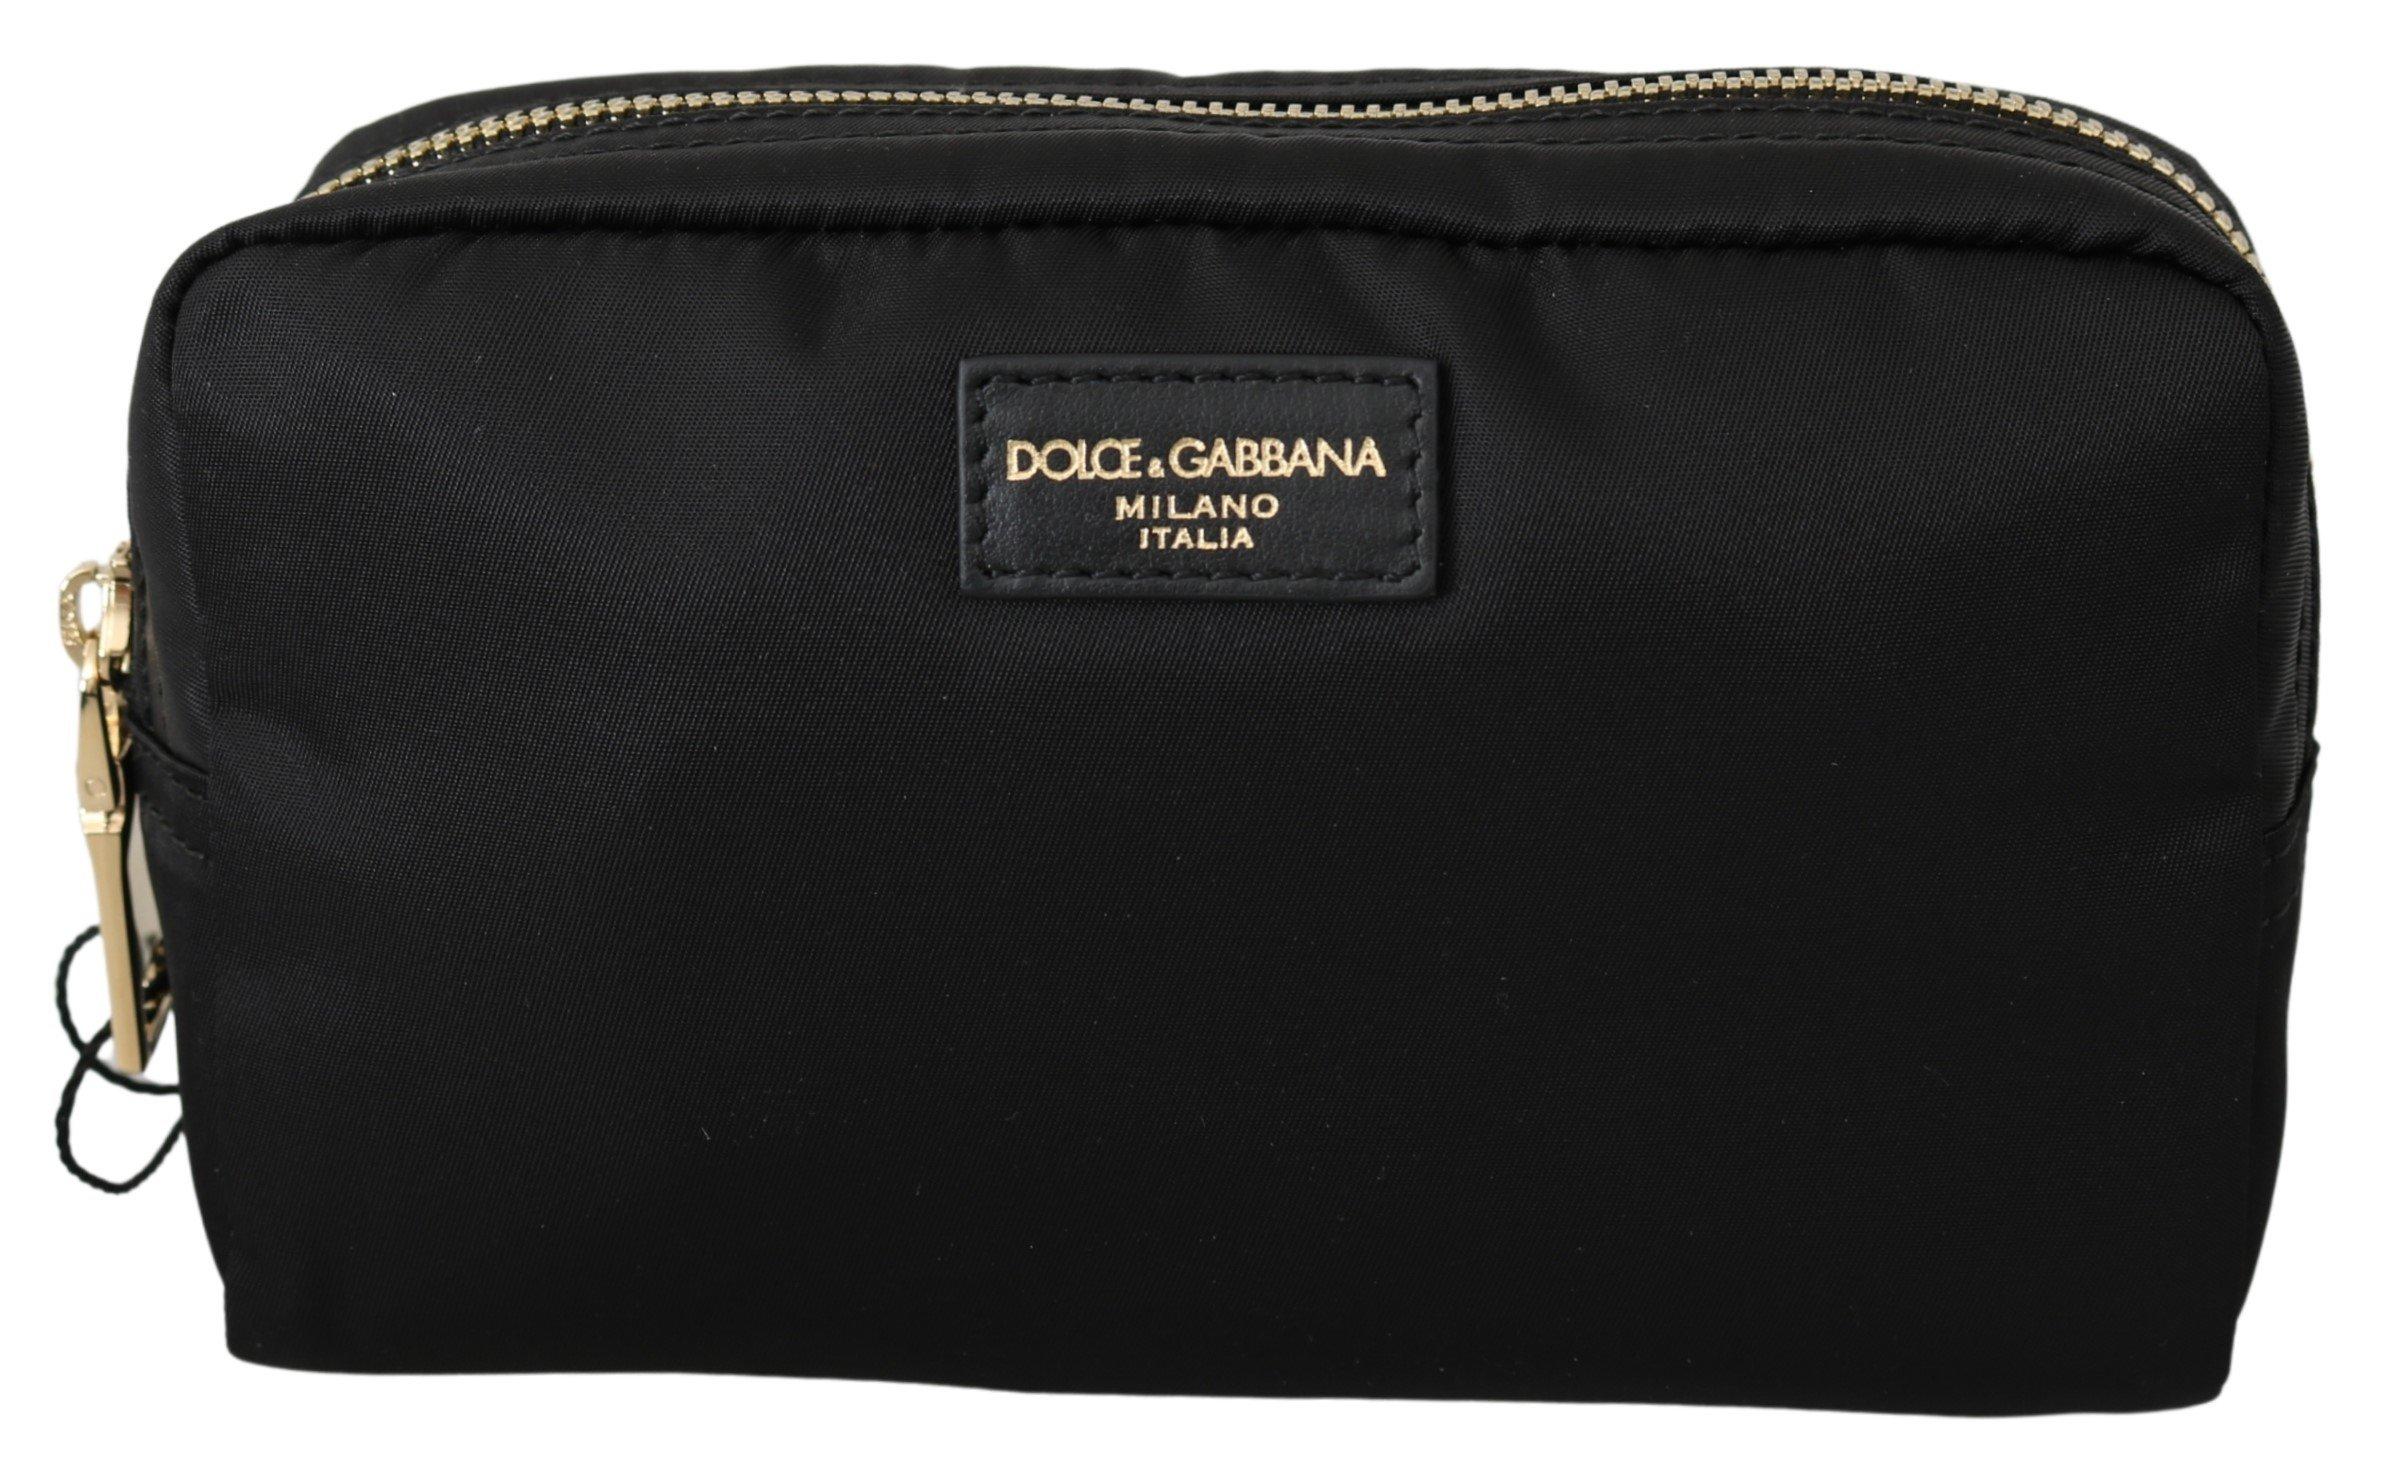 Dolce & Gabbana Women's Toiletry Hand Pouch Nylon Wallet Black VAS10060